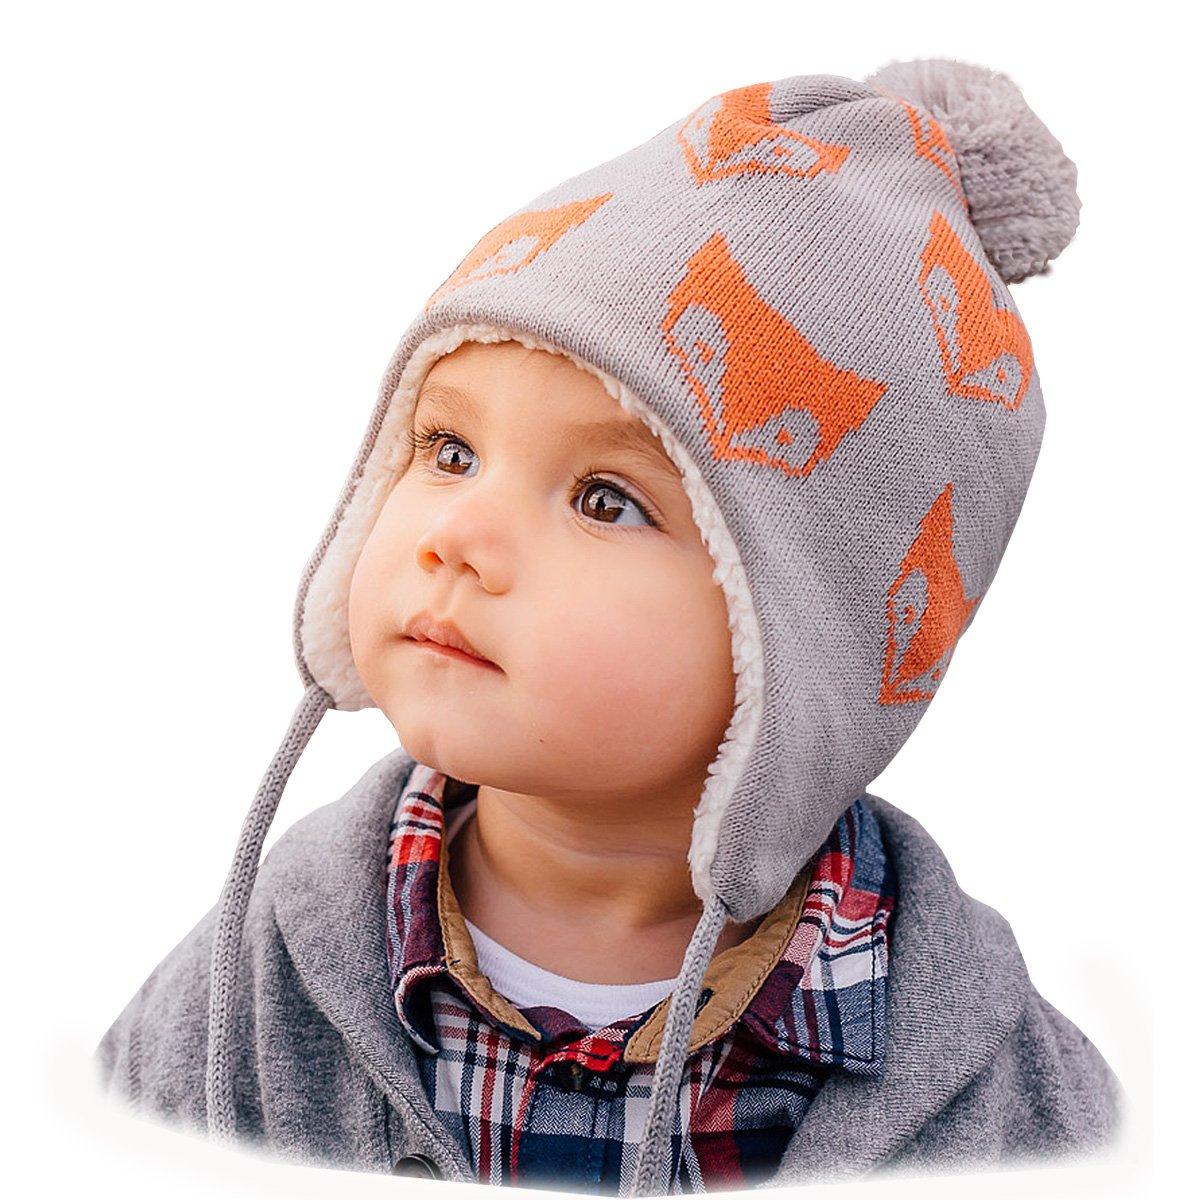 2e67424de30 Best Rated in Boys  Hats   Caps   Helpful Customer Reviews - Amazon.com